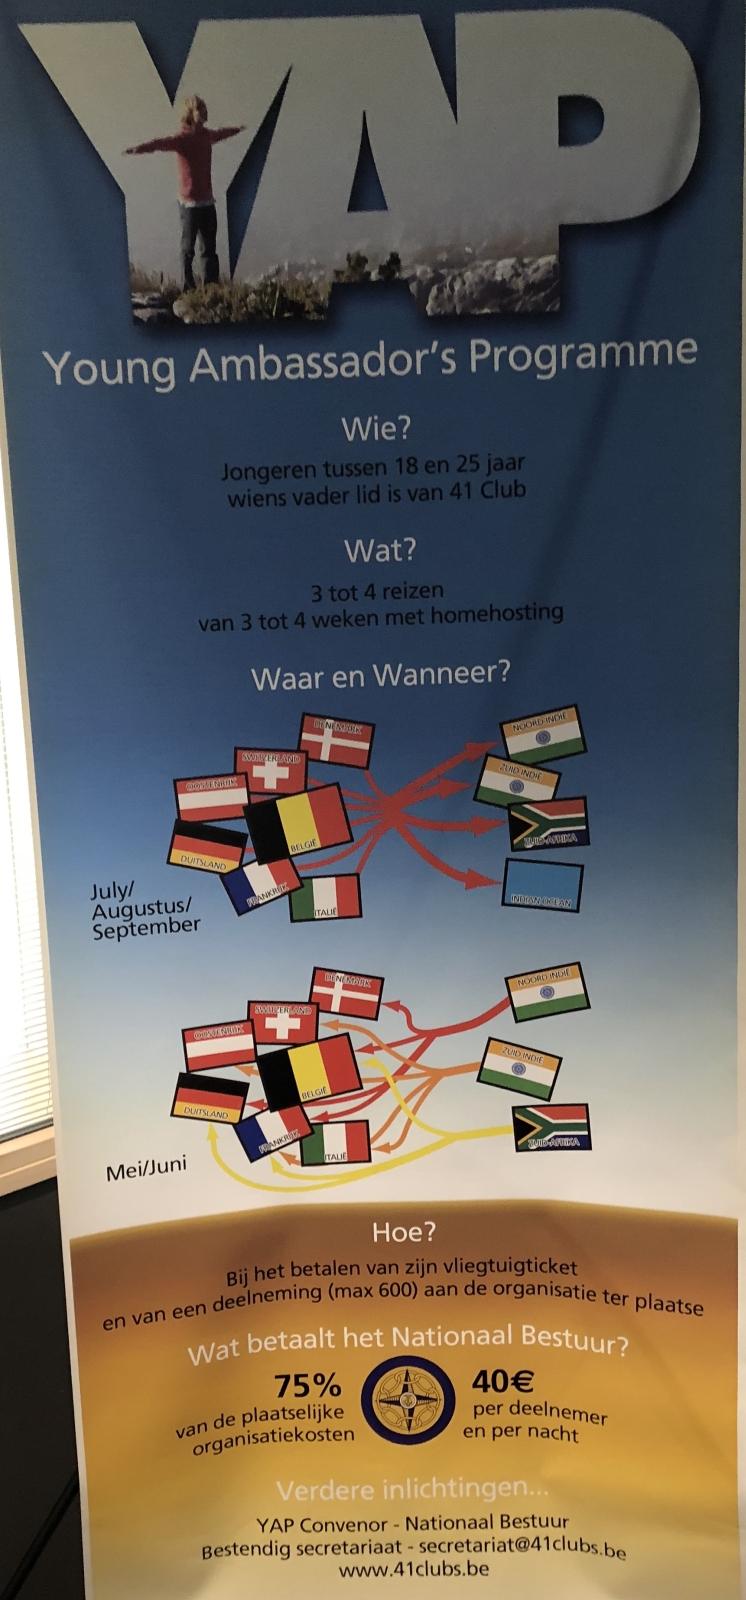 AGM Belgien 2018 Arlon 190